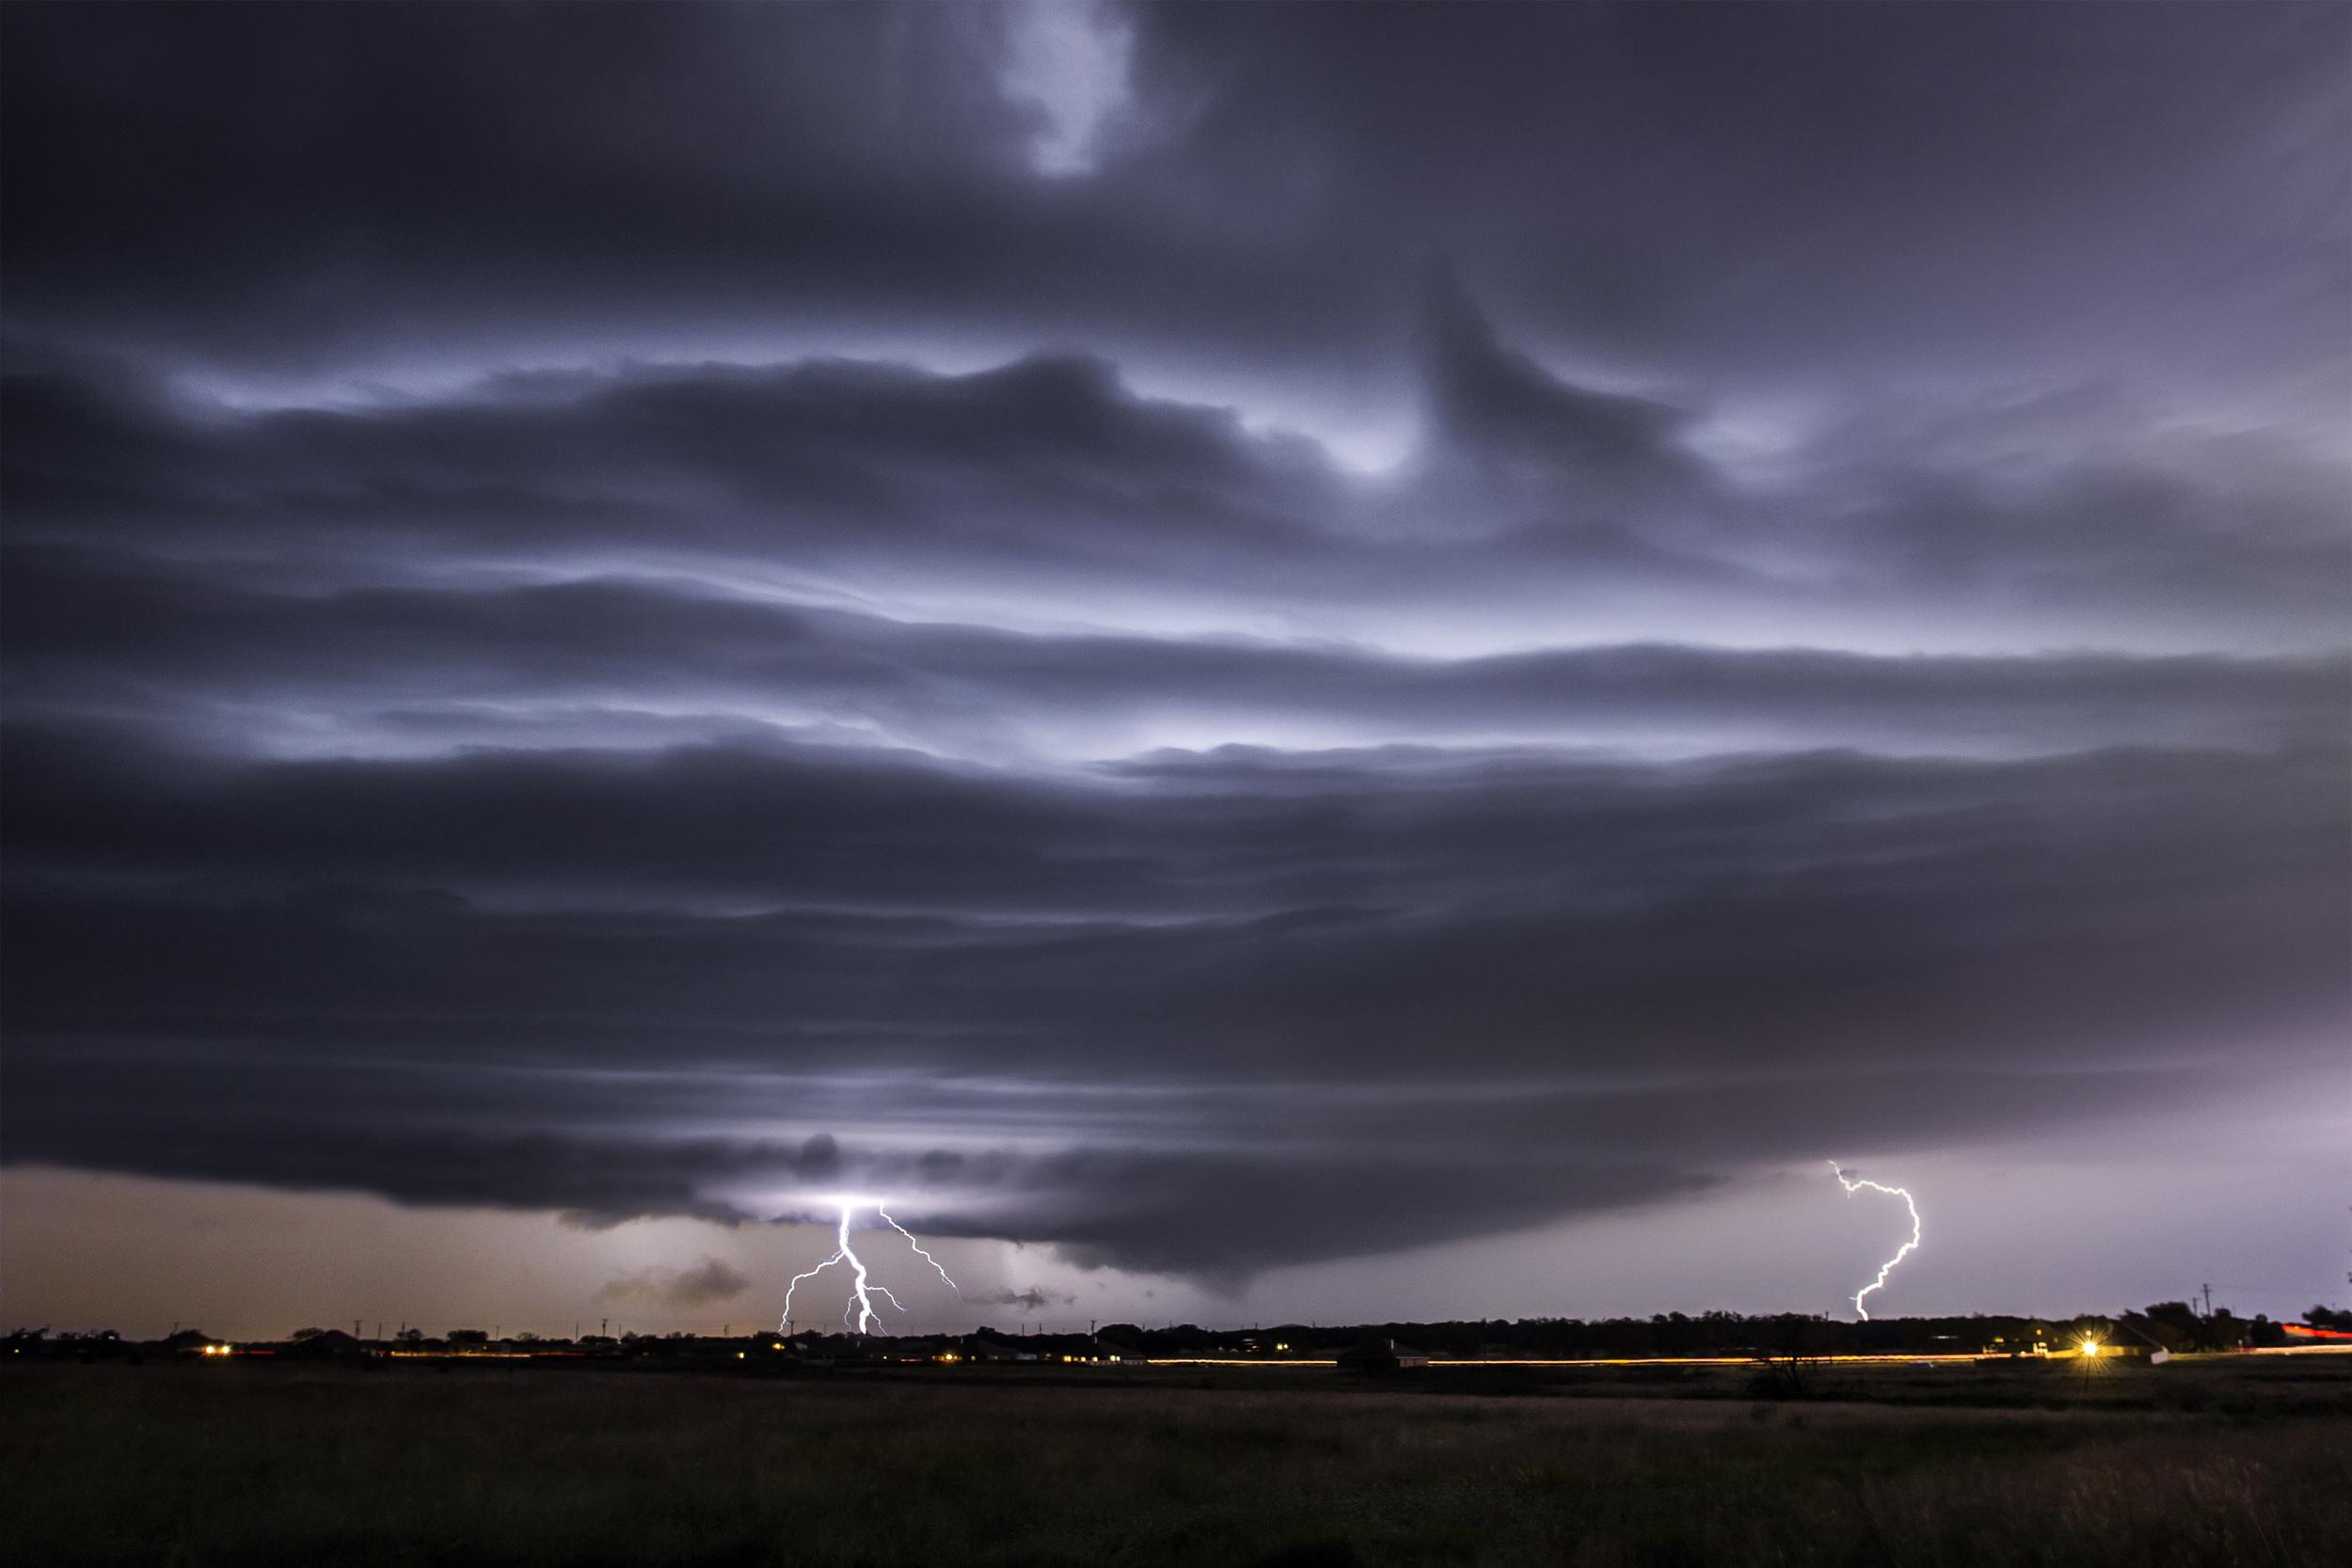 Lightning lit shelf cloud on October 26, 2013 near Salado, Texas